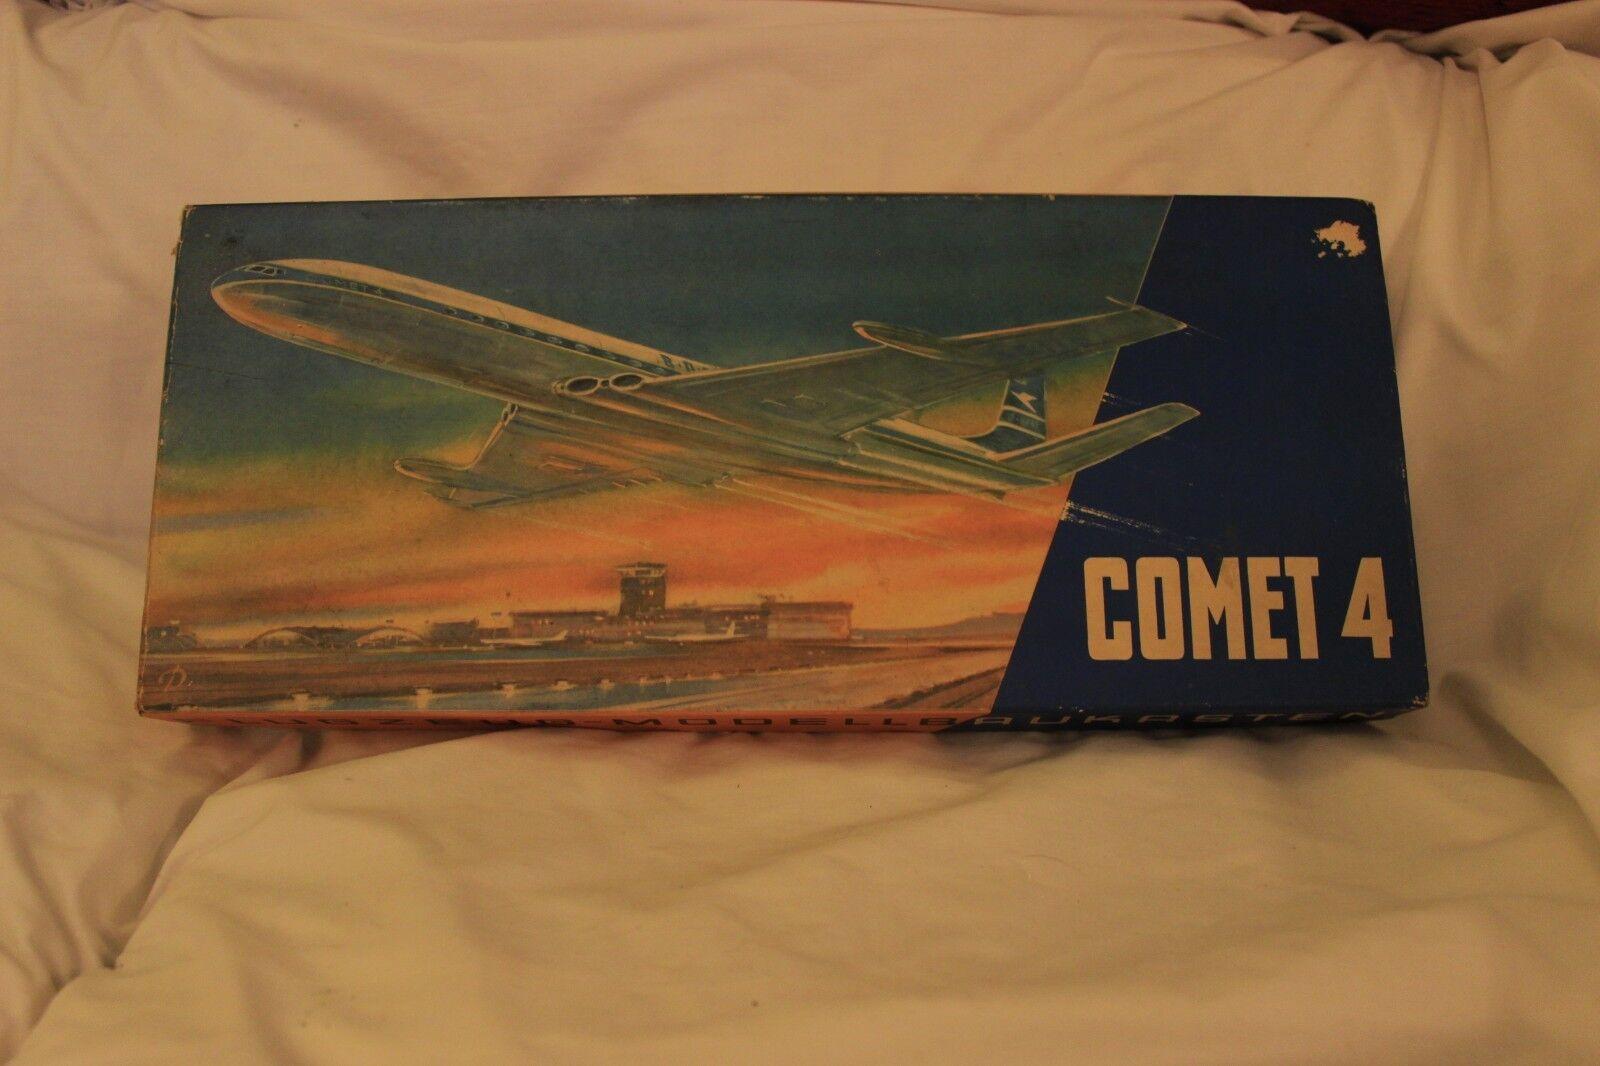 Comet 4 Flugzeug Modellbaukasten 1 100 Vintage Box 1966 model kit